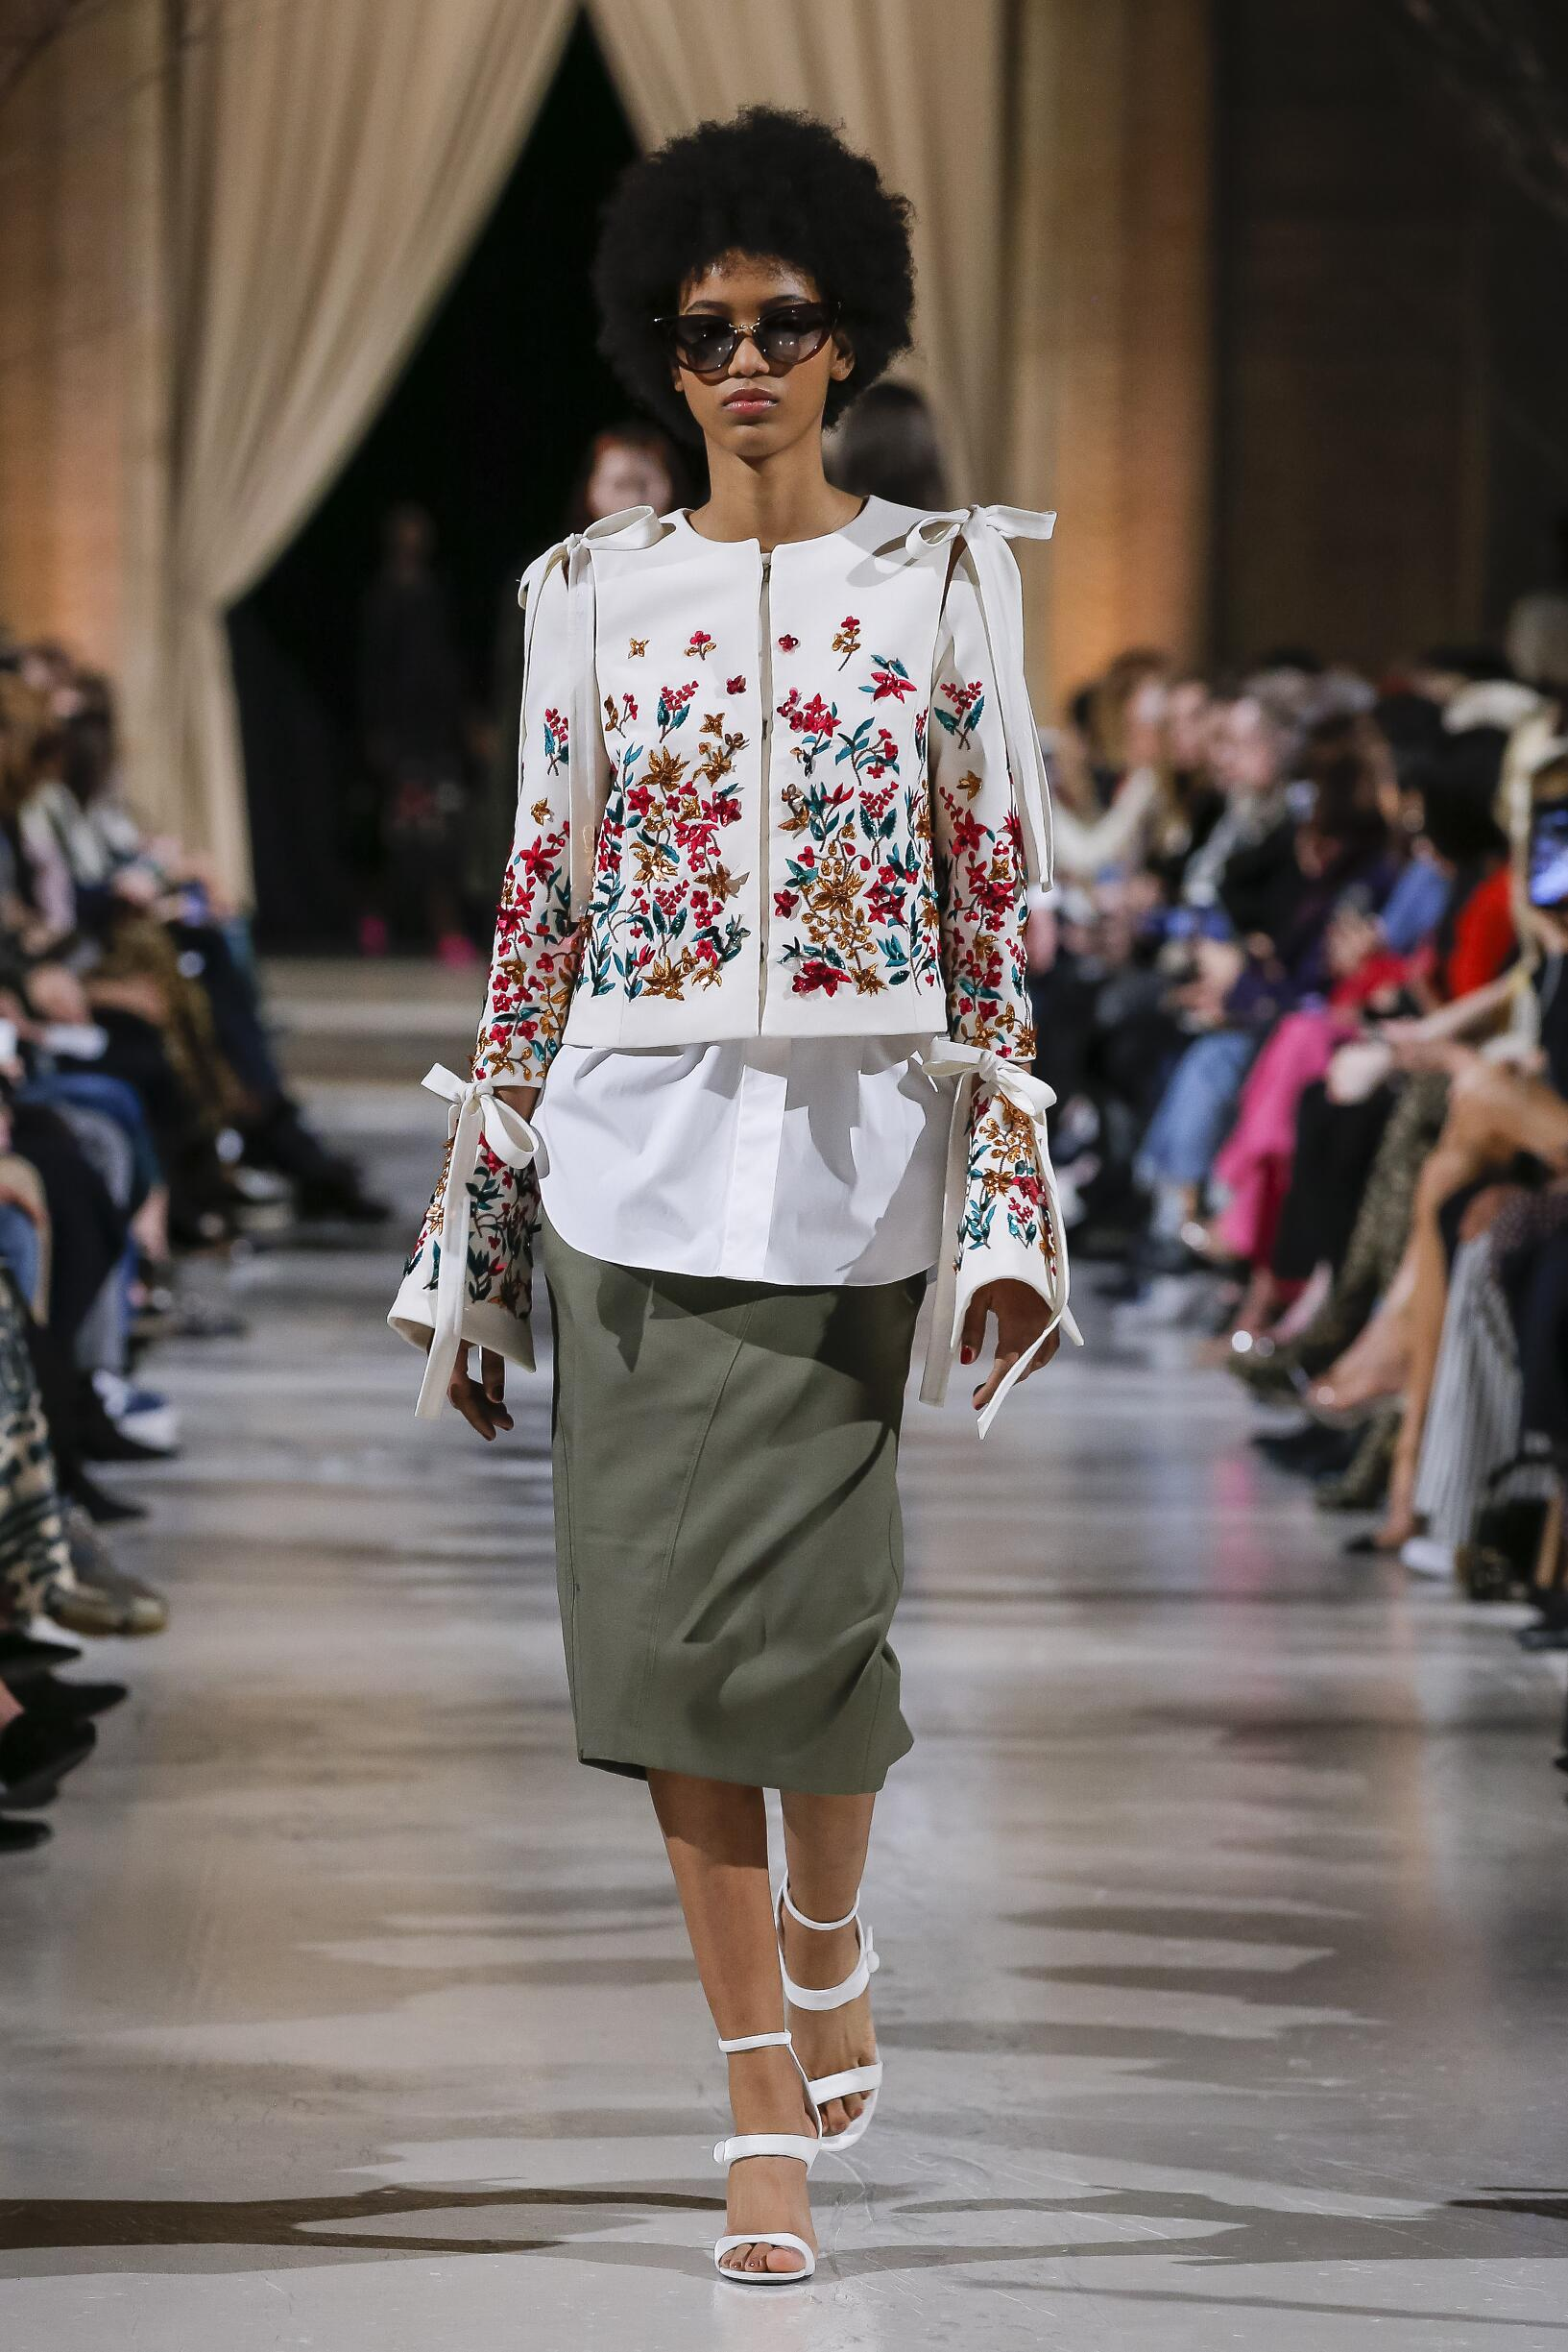 Runway Oscar de la Renta Fall Winter 2018 Women's Collection New York Fashion Week